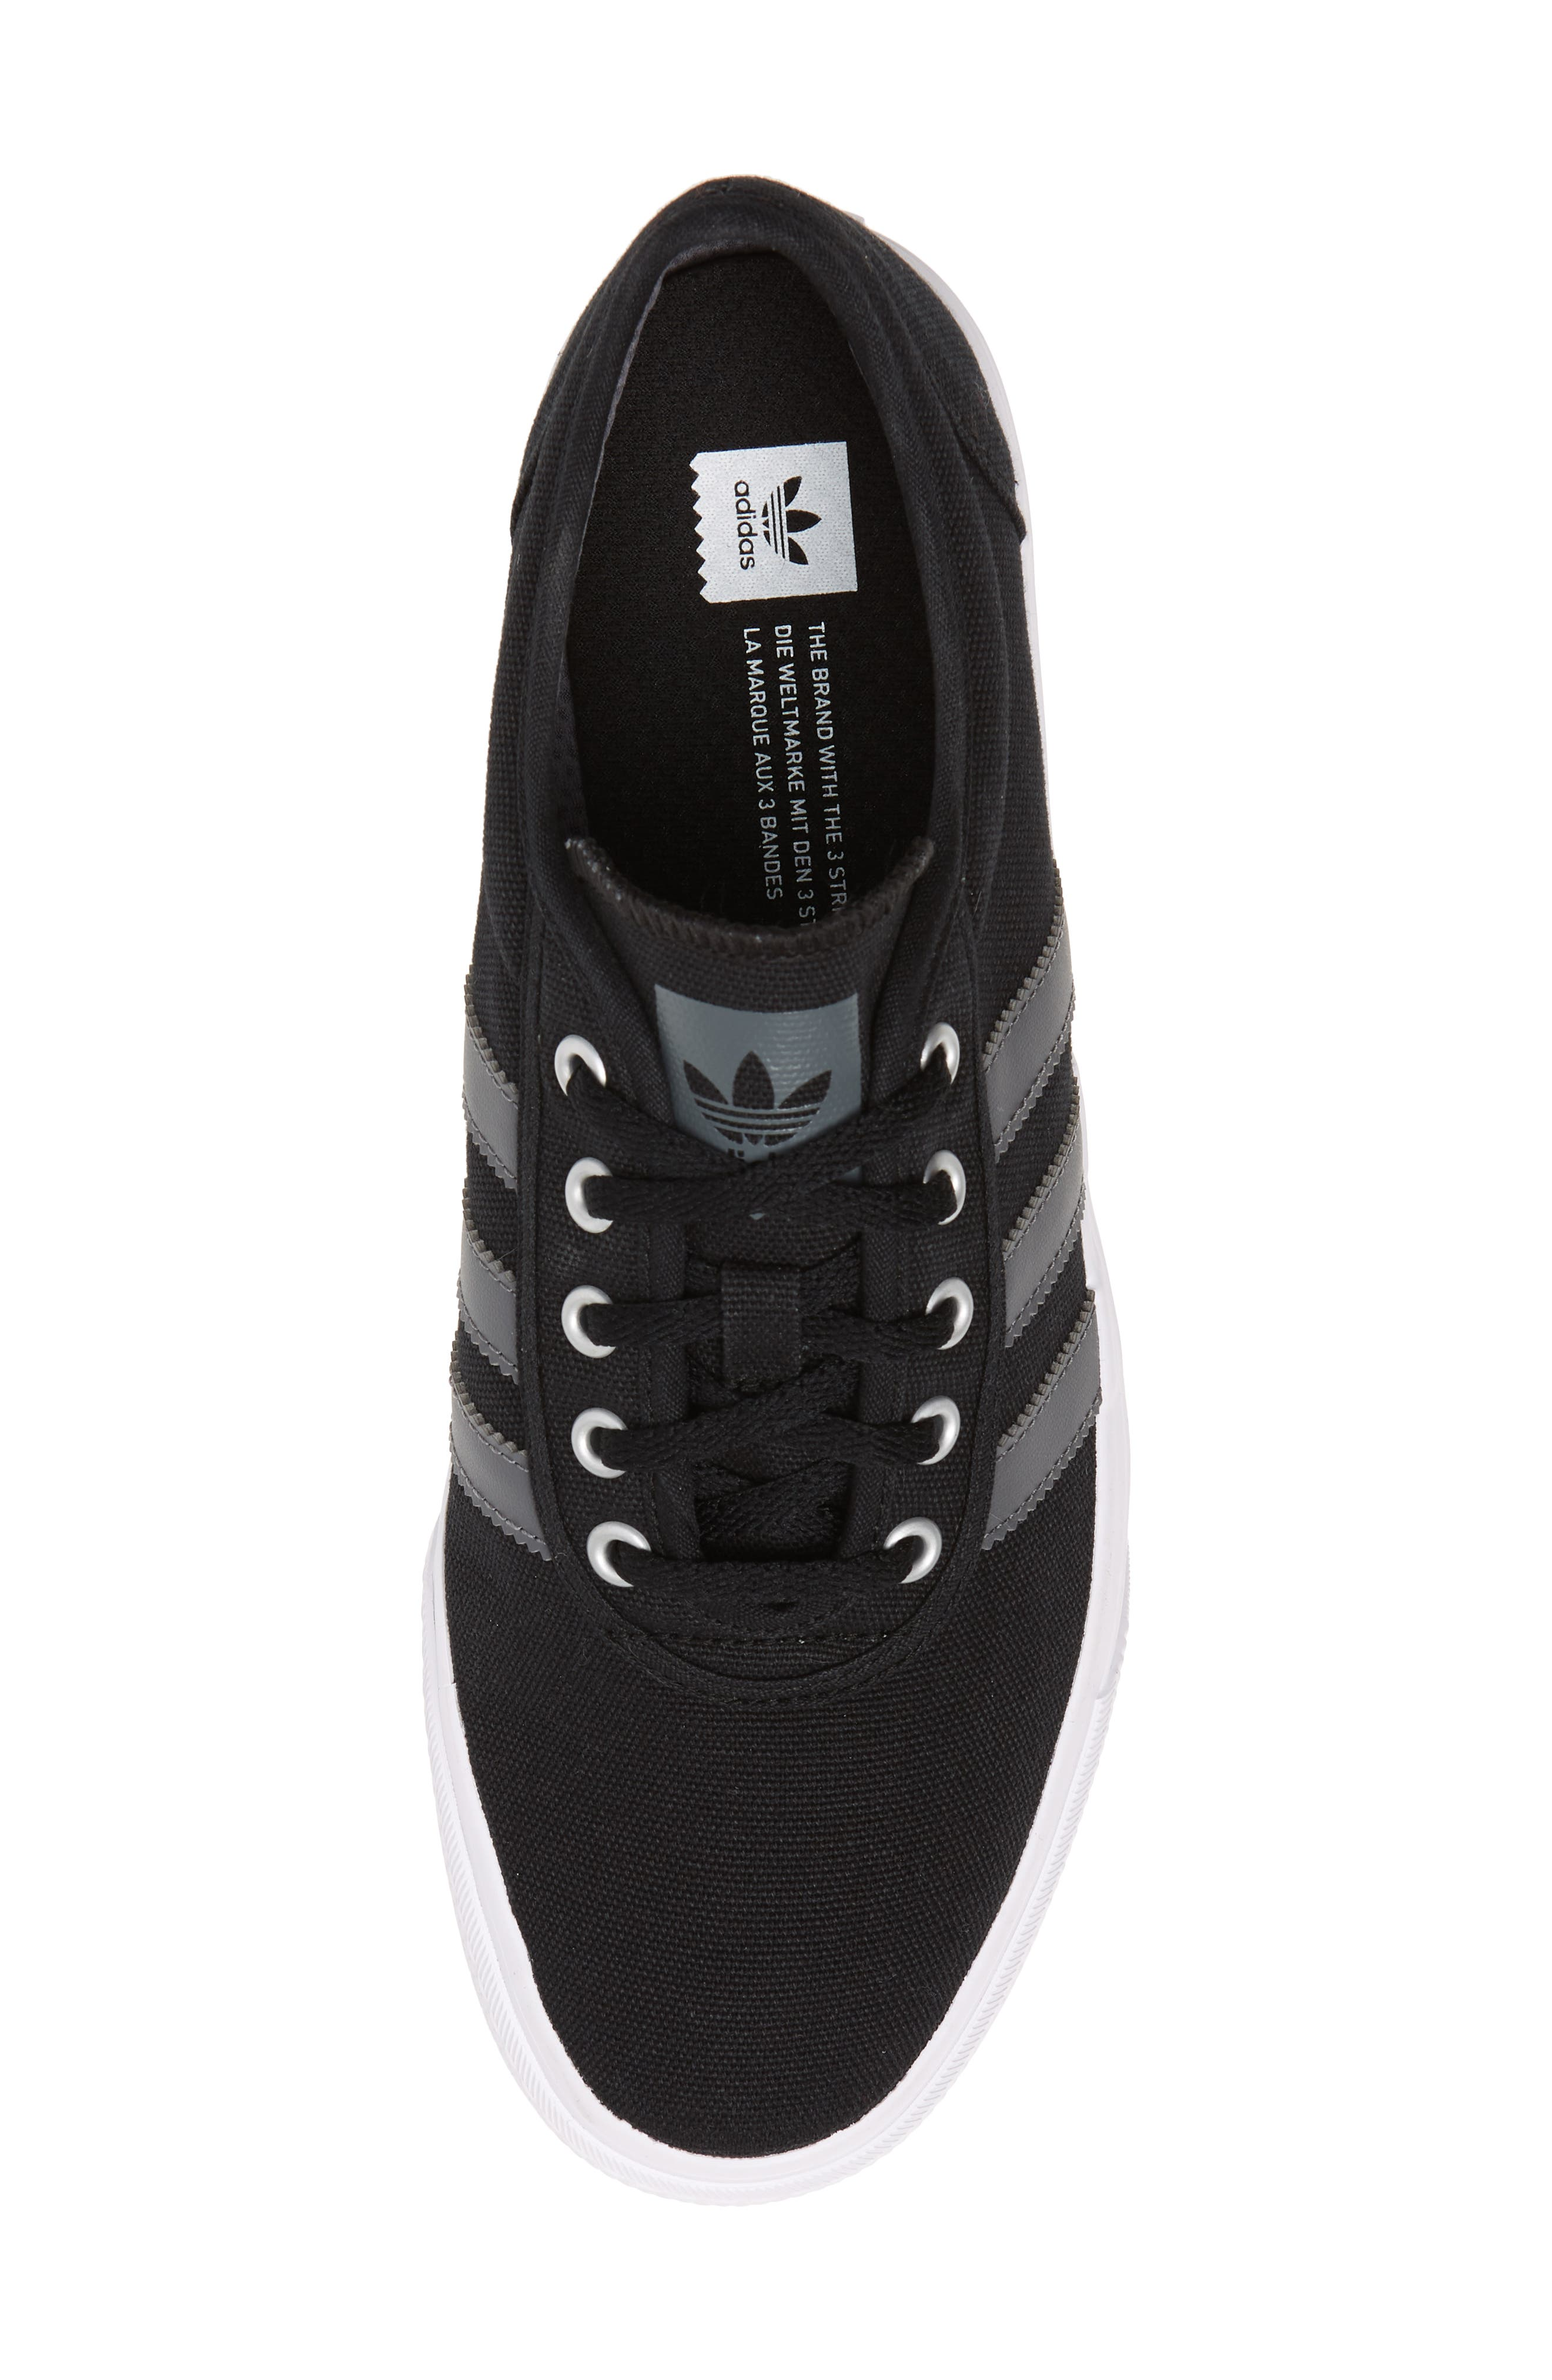 Adiease Skate Sneaker,                             Alternate thumbnail 5, color,                             001